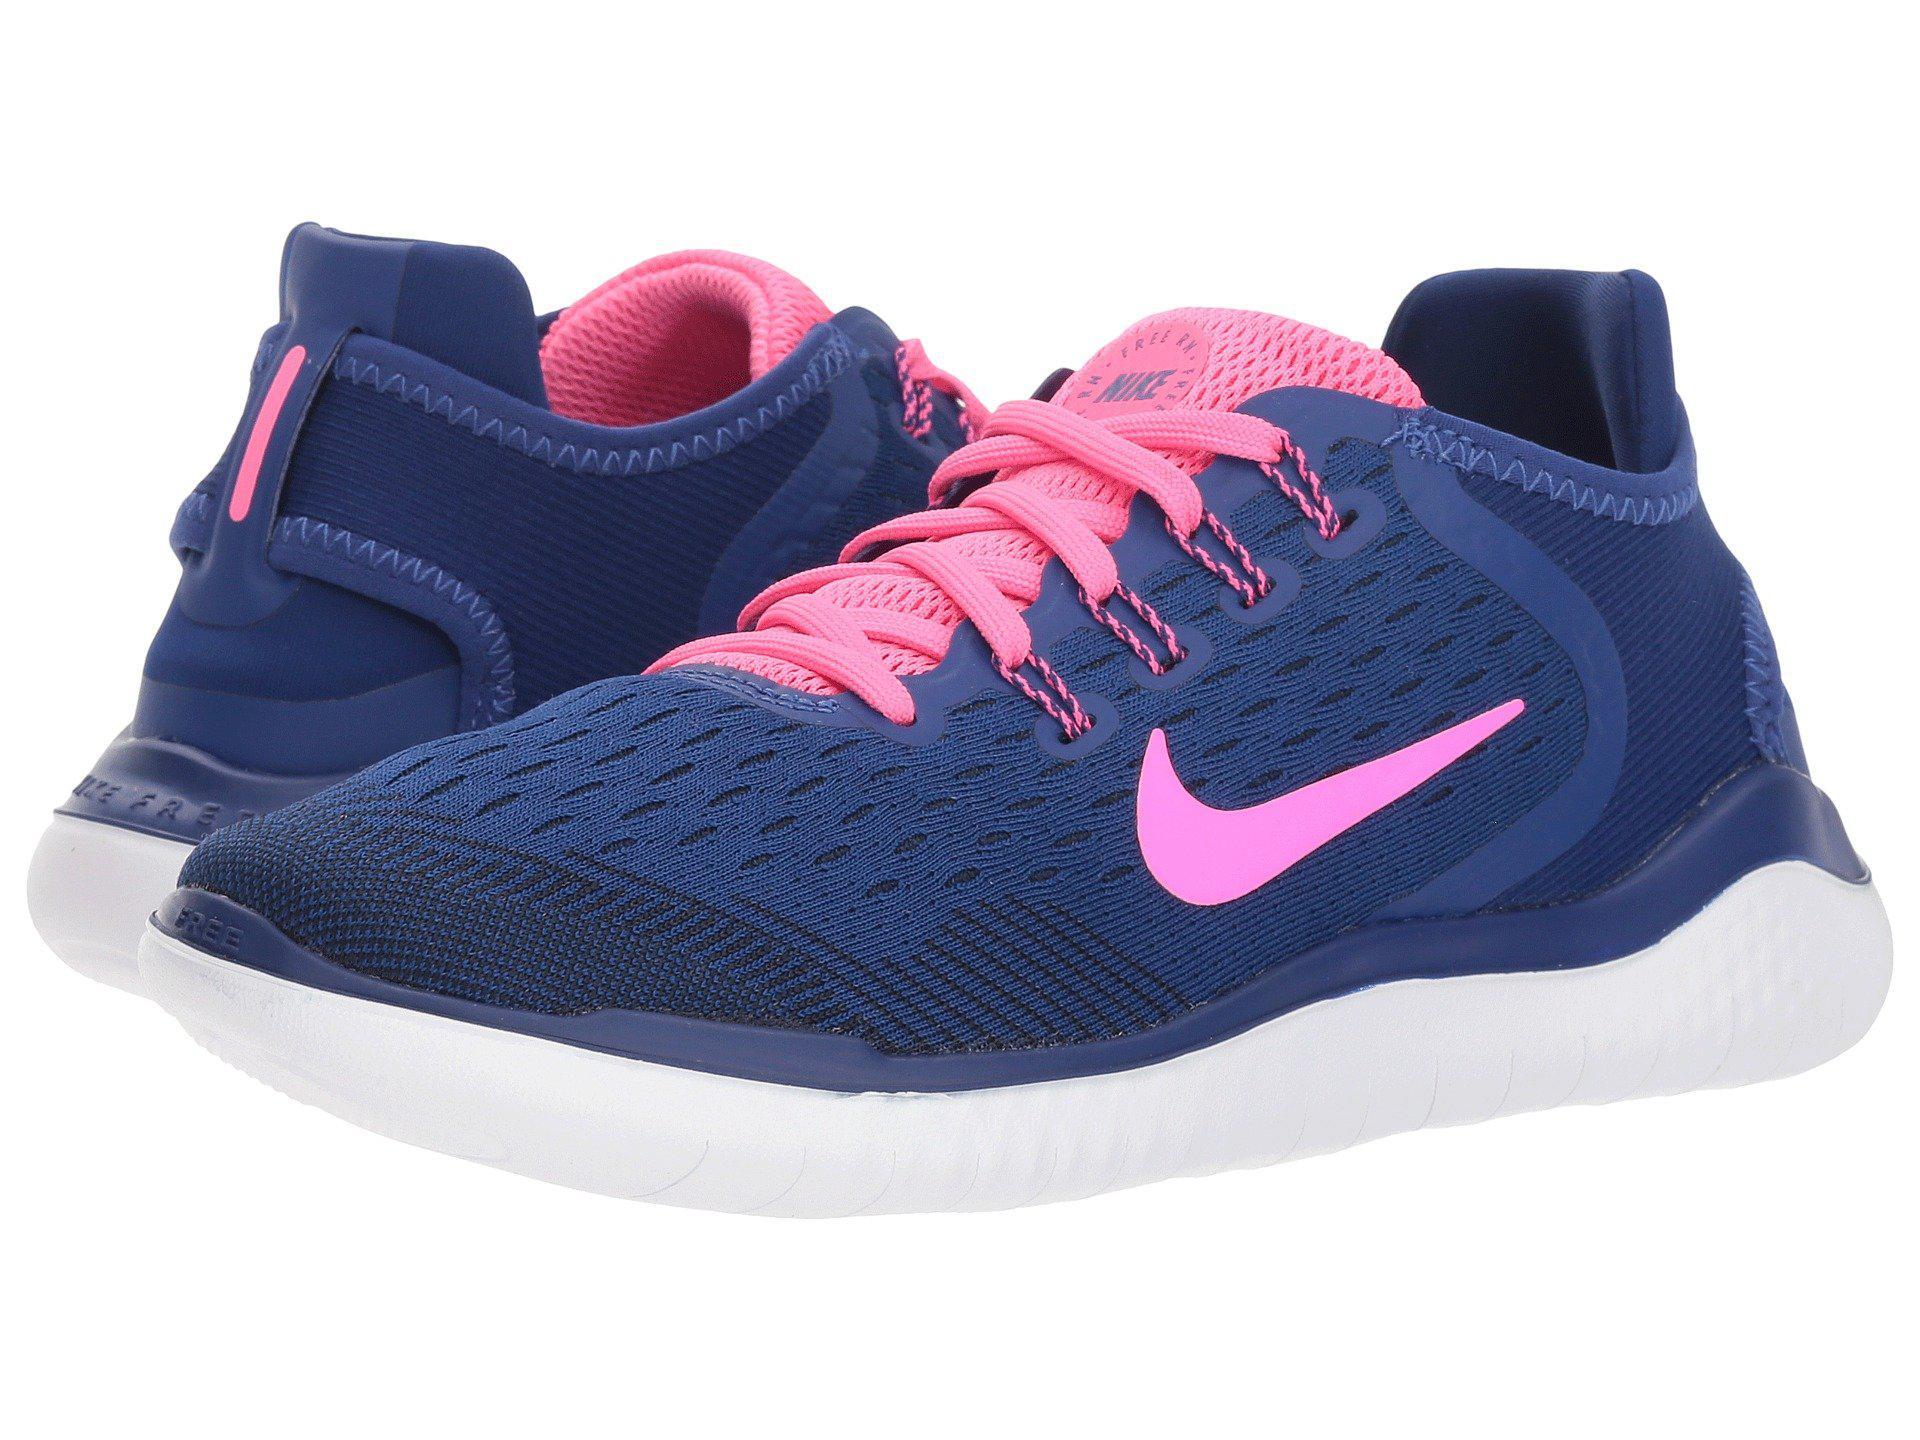 50c837539e06f ... usa nike. blue free rn 2018 black metallic gold vast grey womens  running shoes c31aa